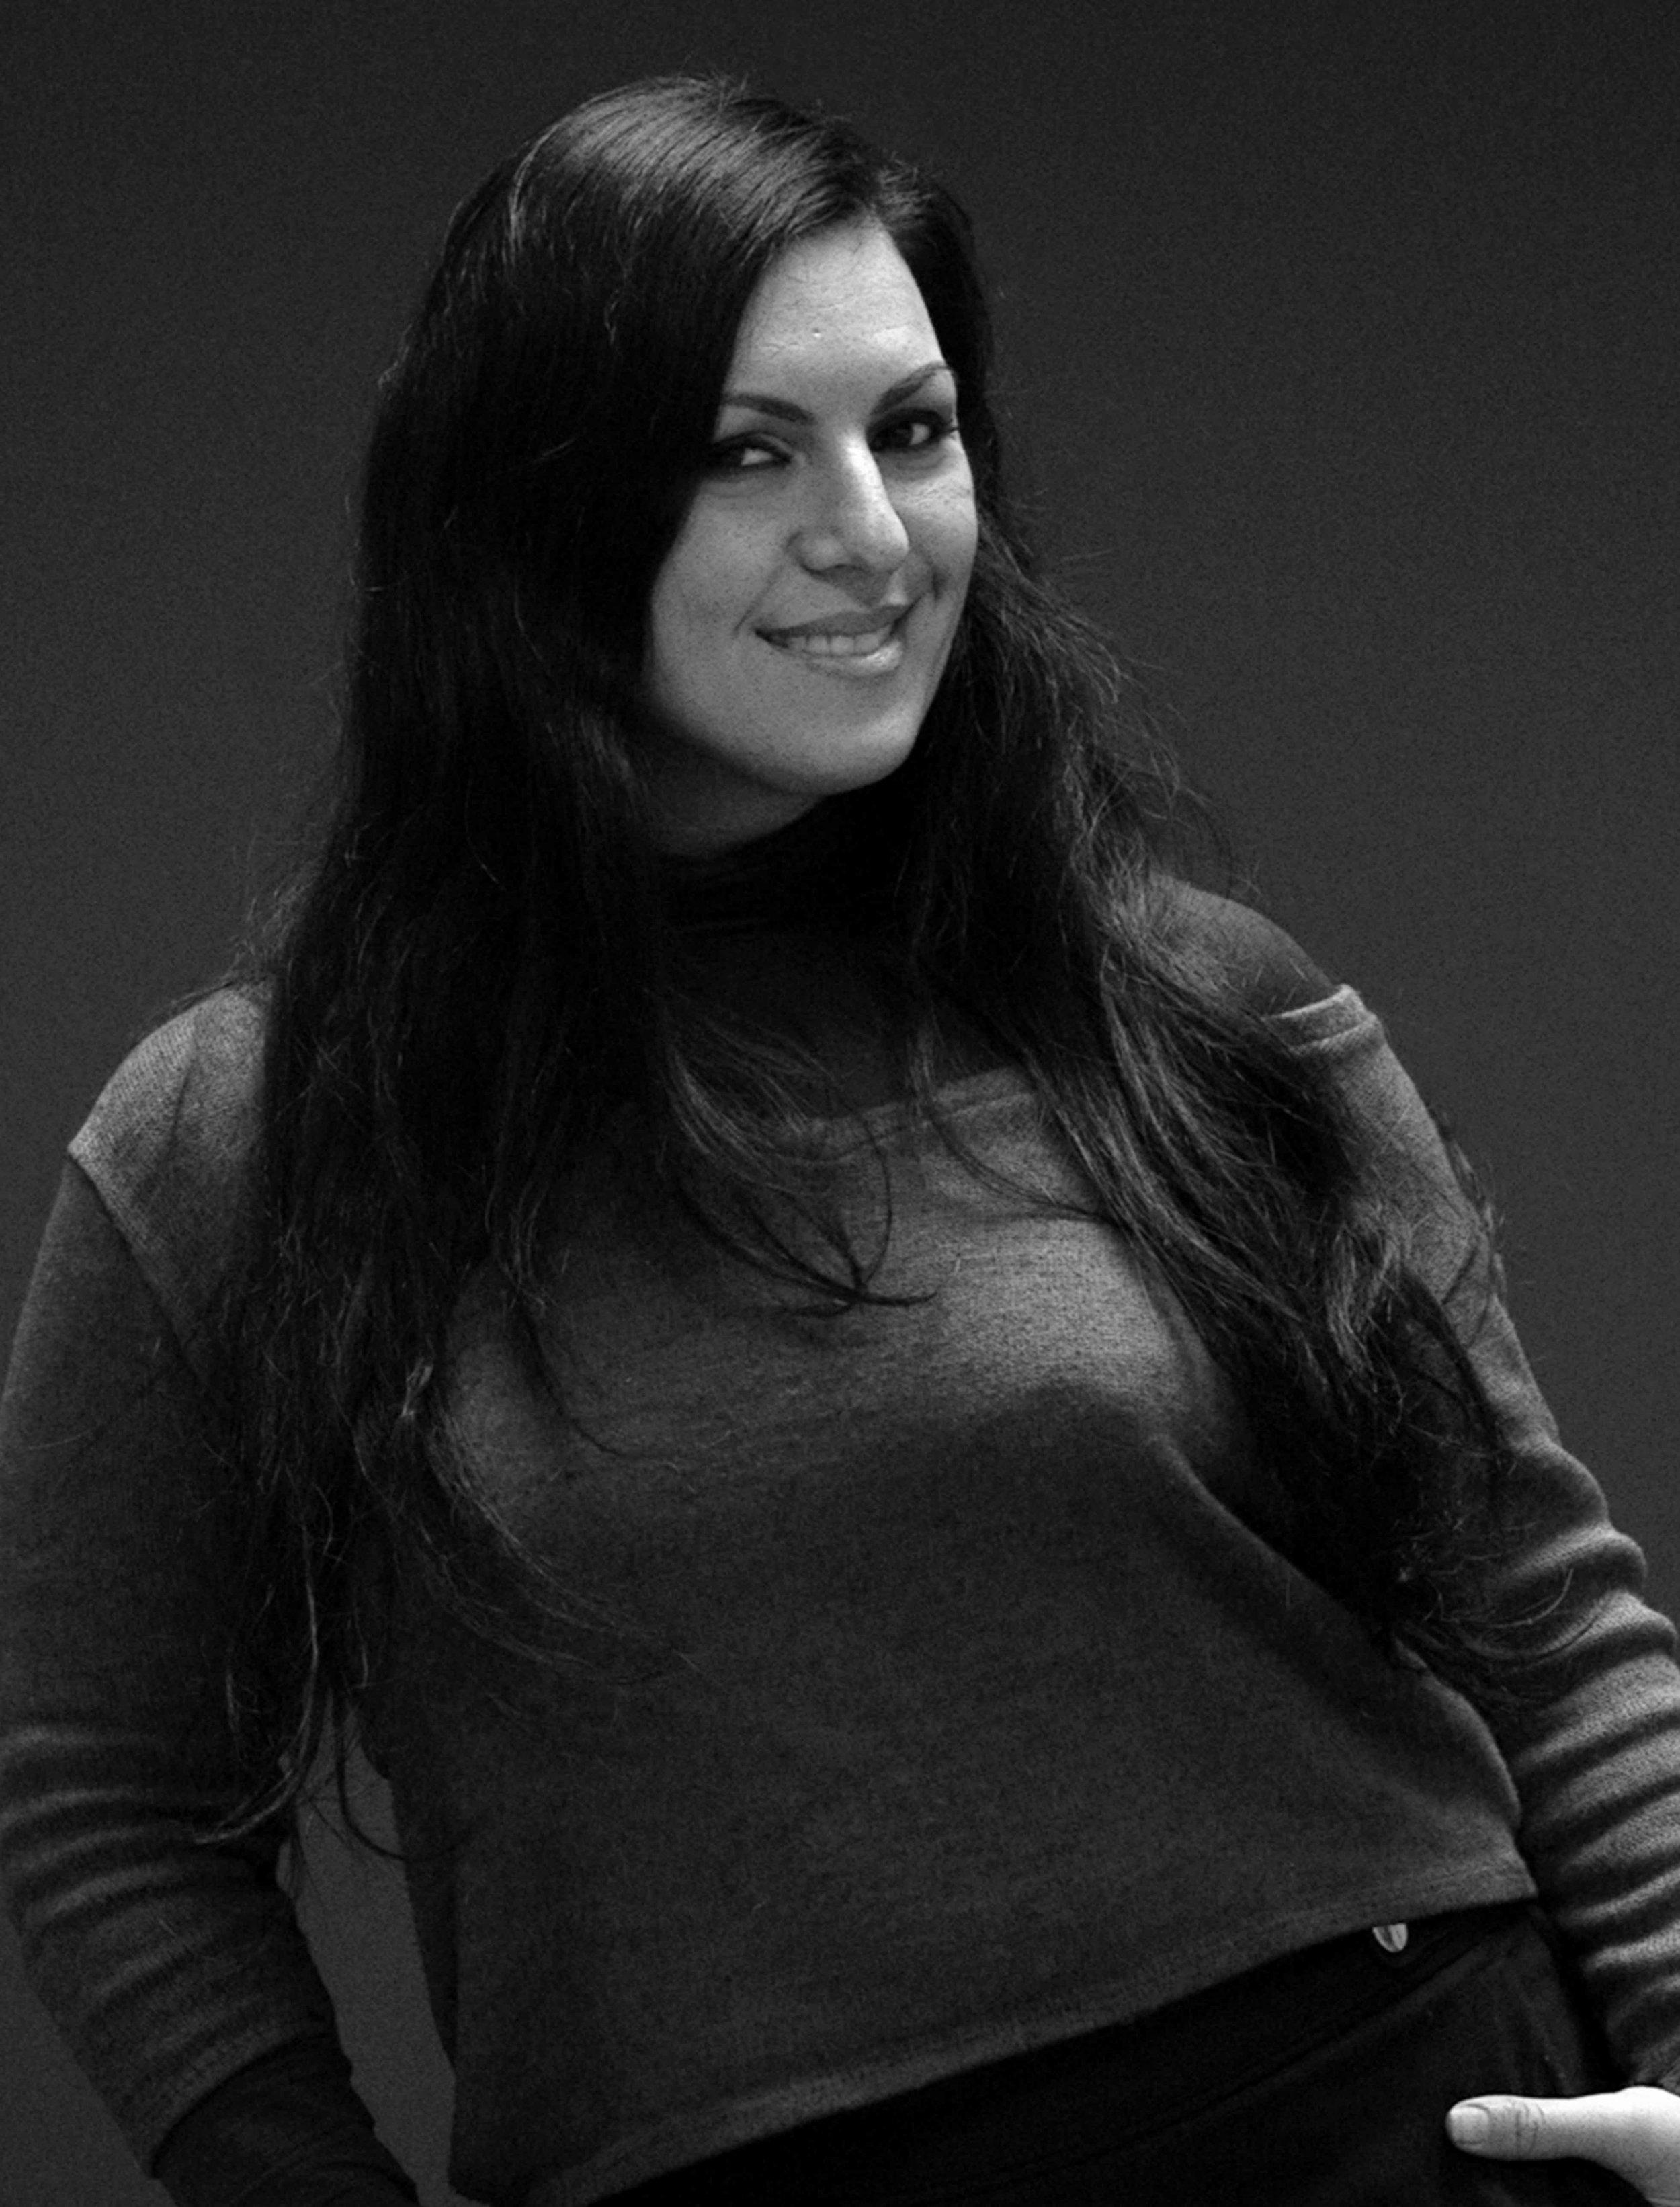 Anna Rosa Paladino - International office manager